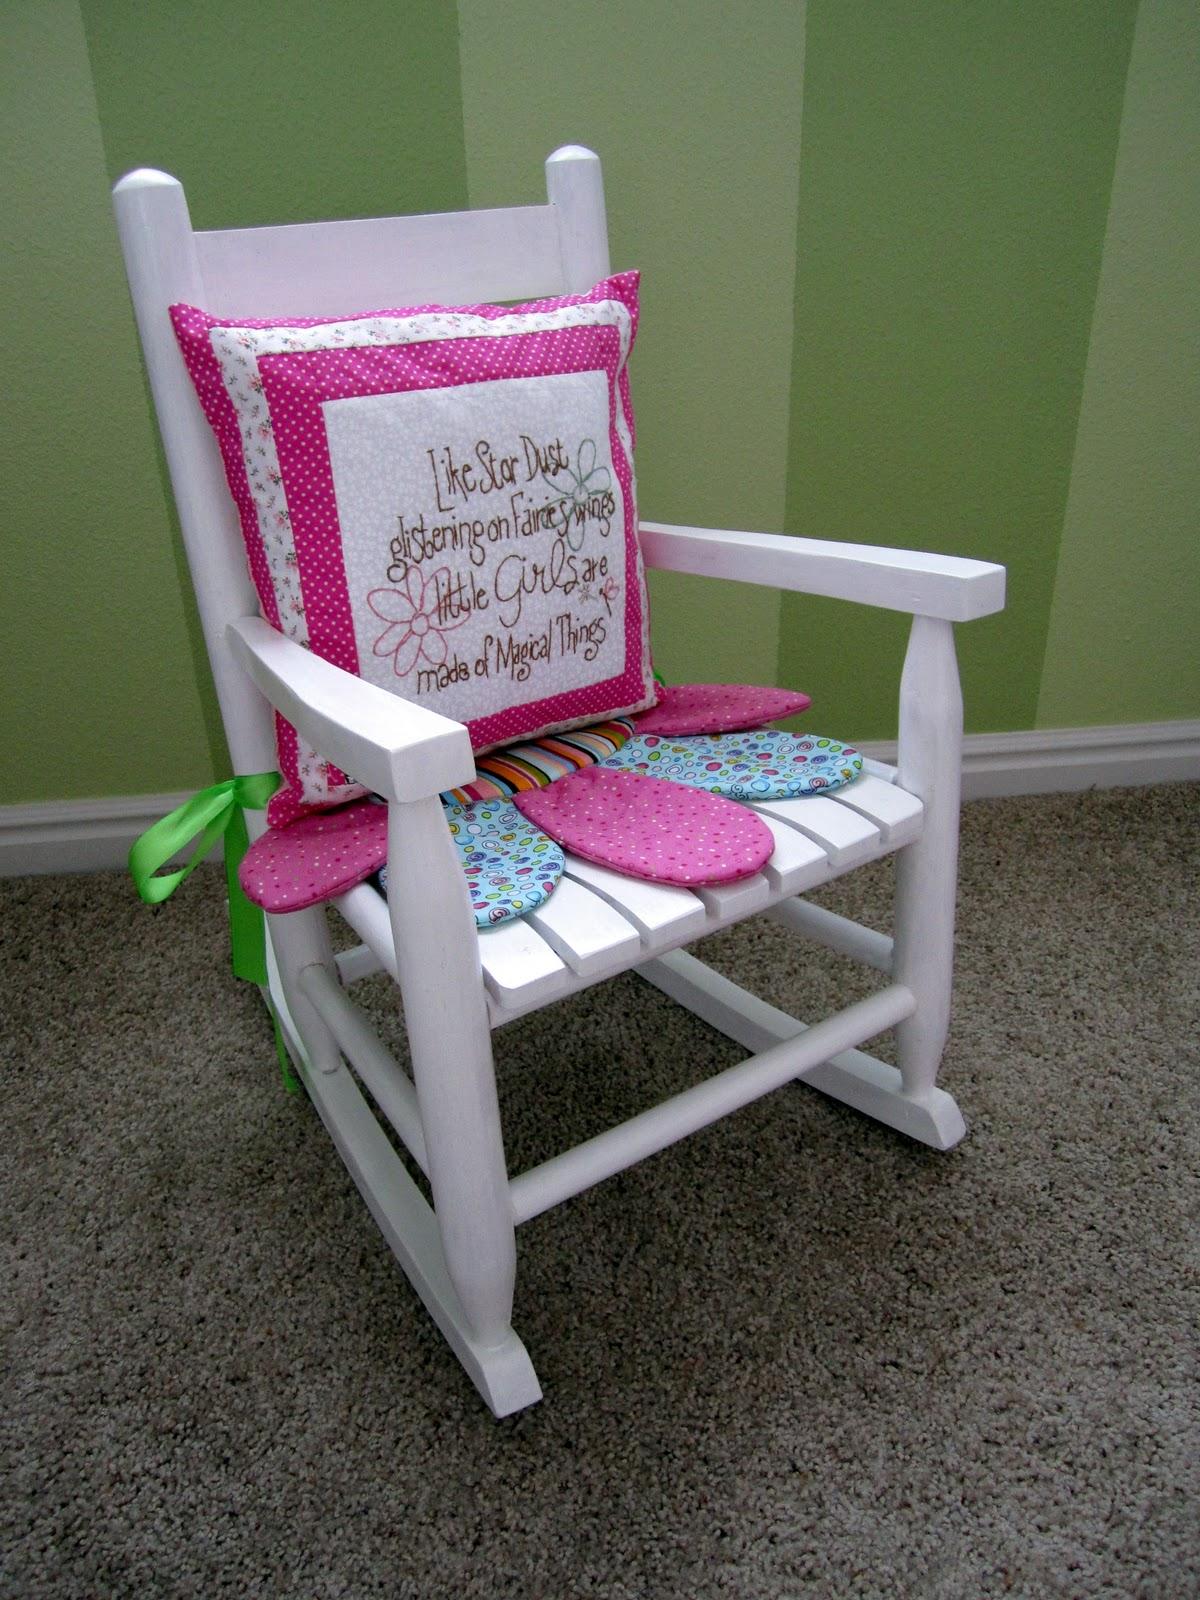 Pretty Lil Posies McKinley s Rockin Rocking Chair & Other Cute Stuff